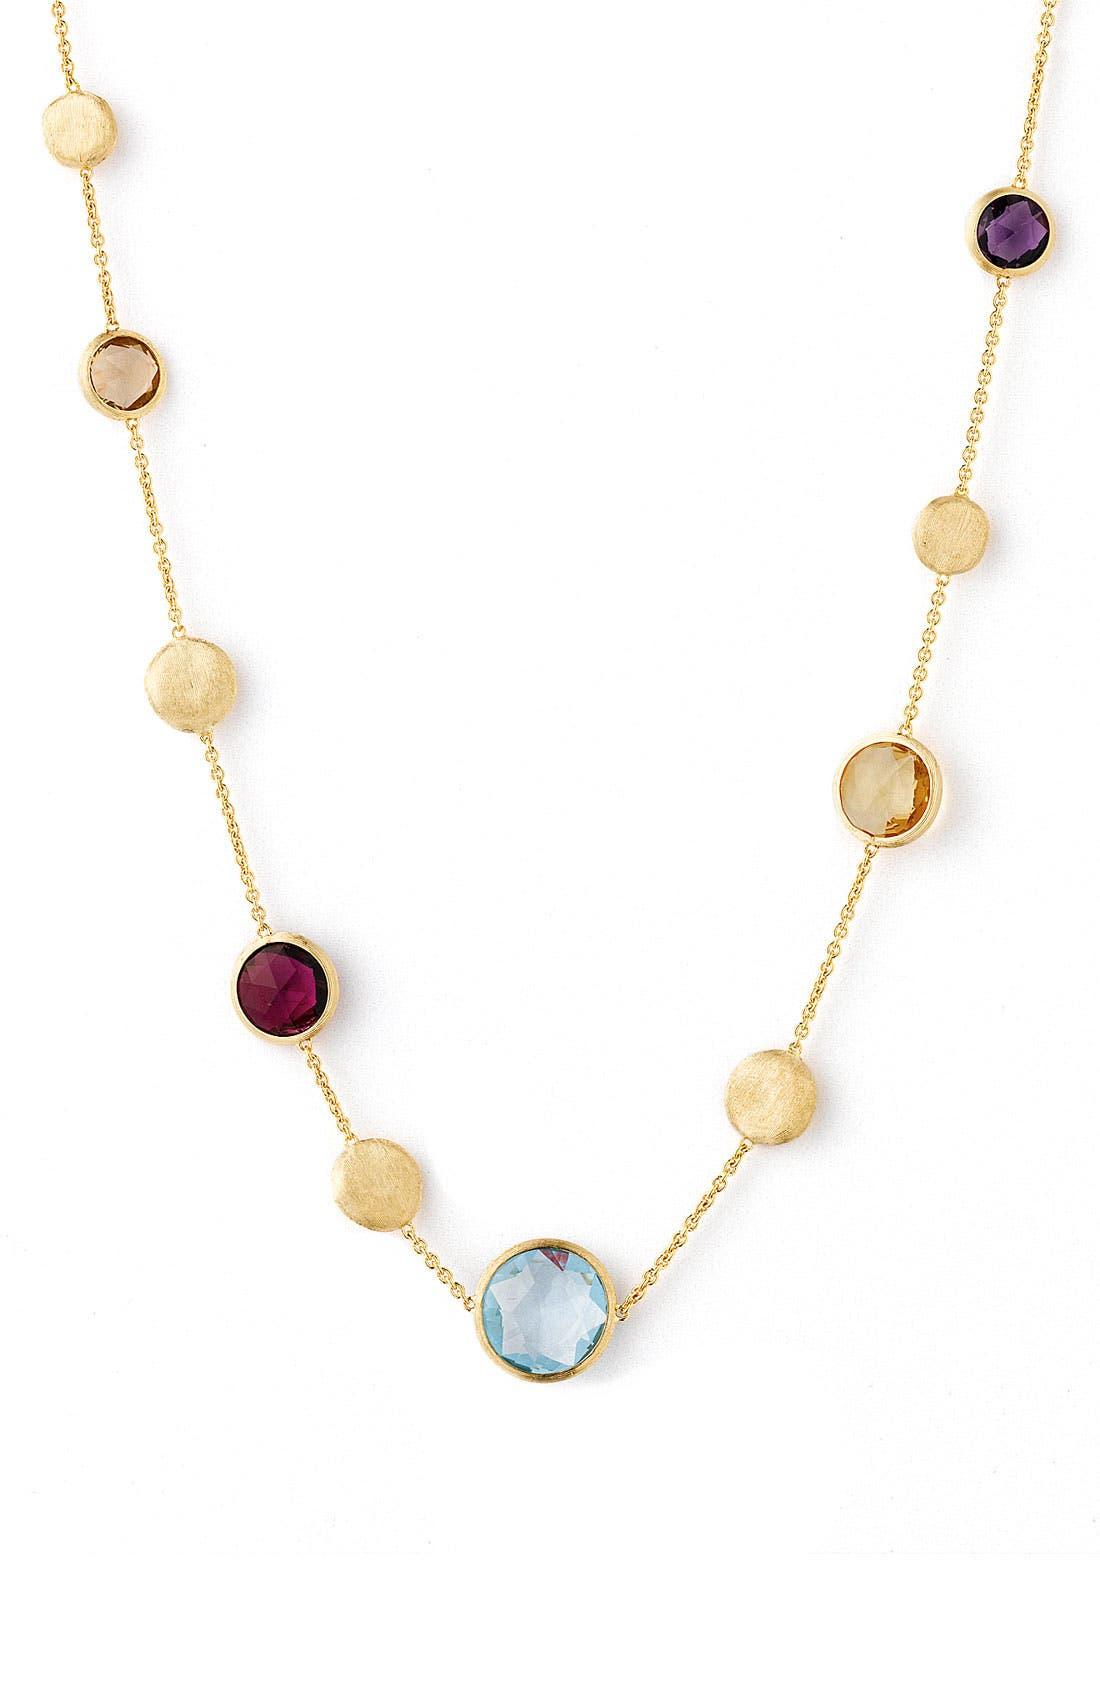 Main Image - Marco Bicego 'Jaipur' Single Strand Semiprecious Necklace